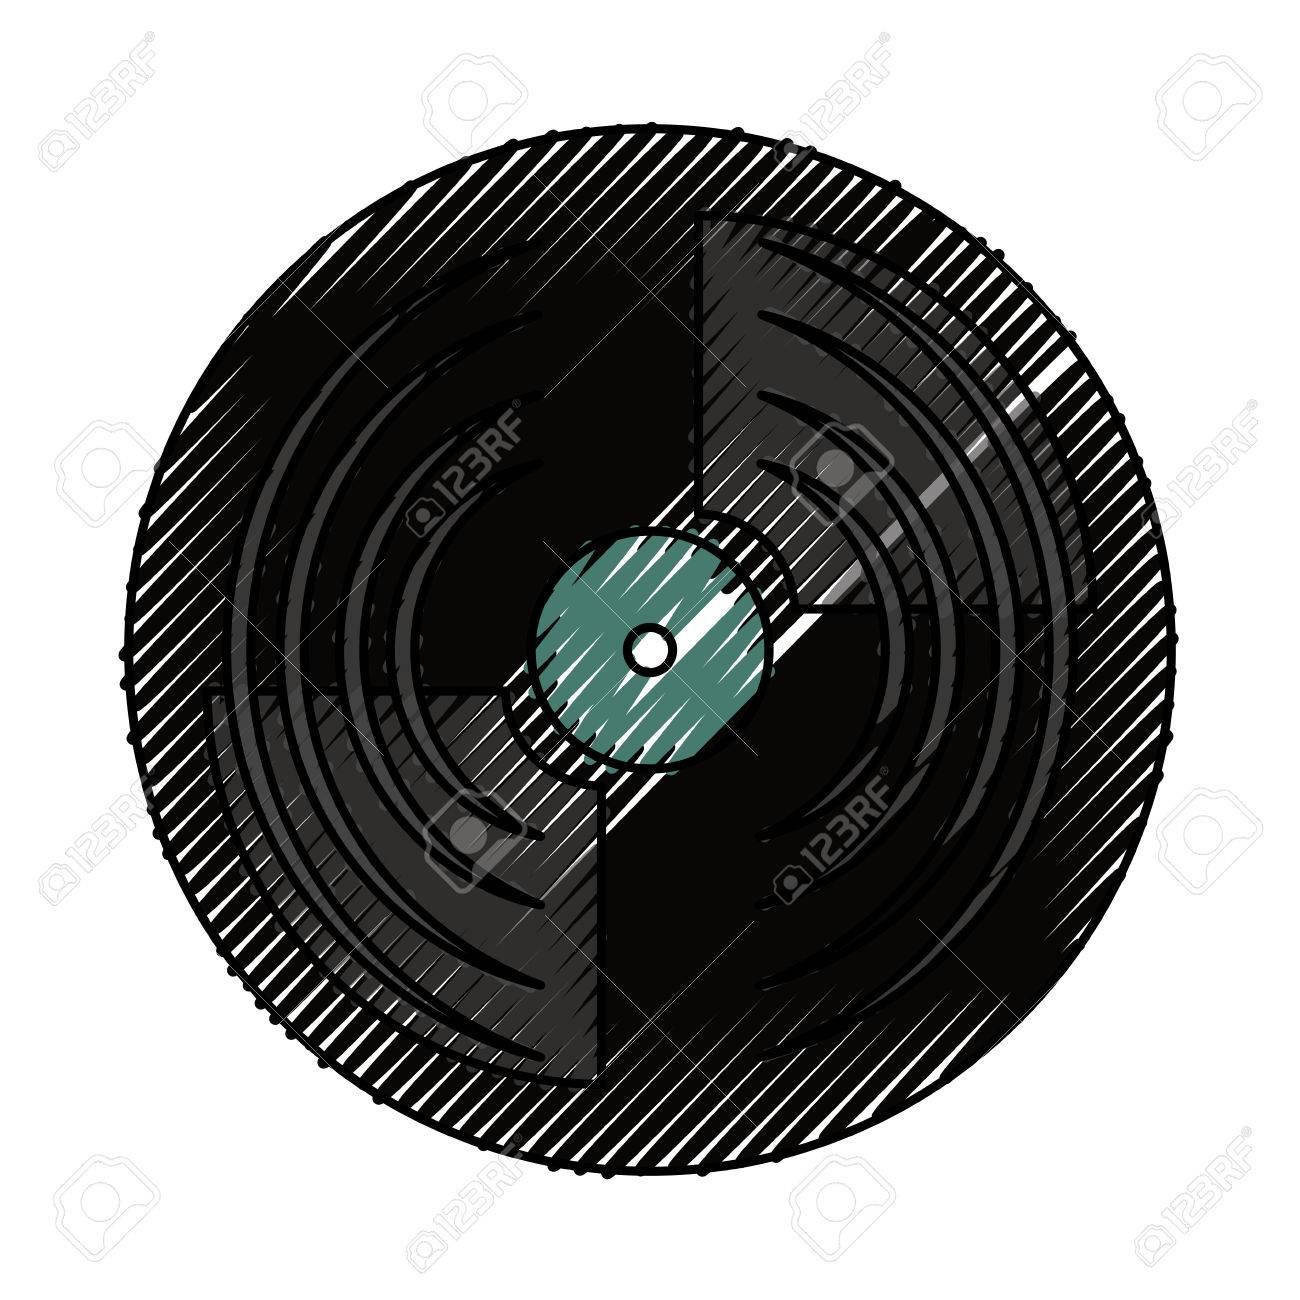 vinyl record turntable icon vector illustration graphic design rh 123rf com vinyl record vector logo vinyl record vector tutorial